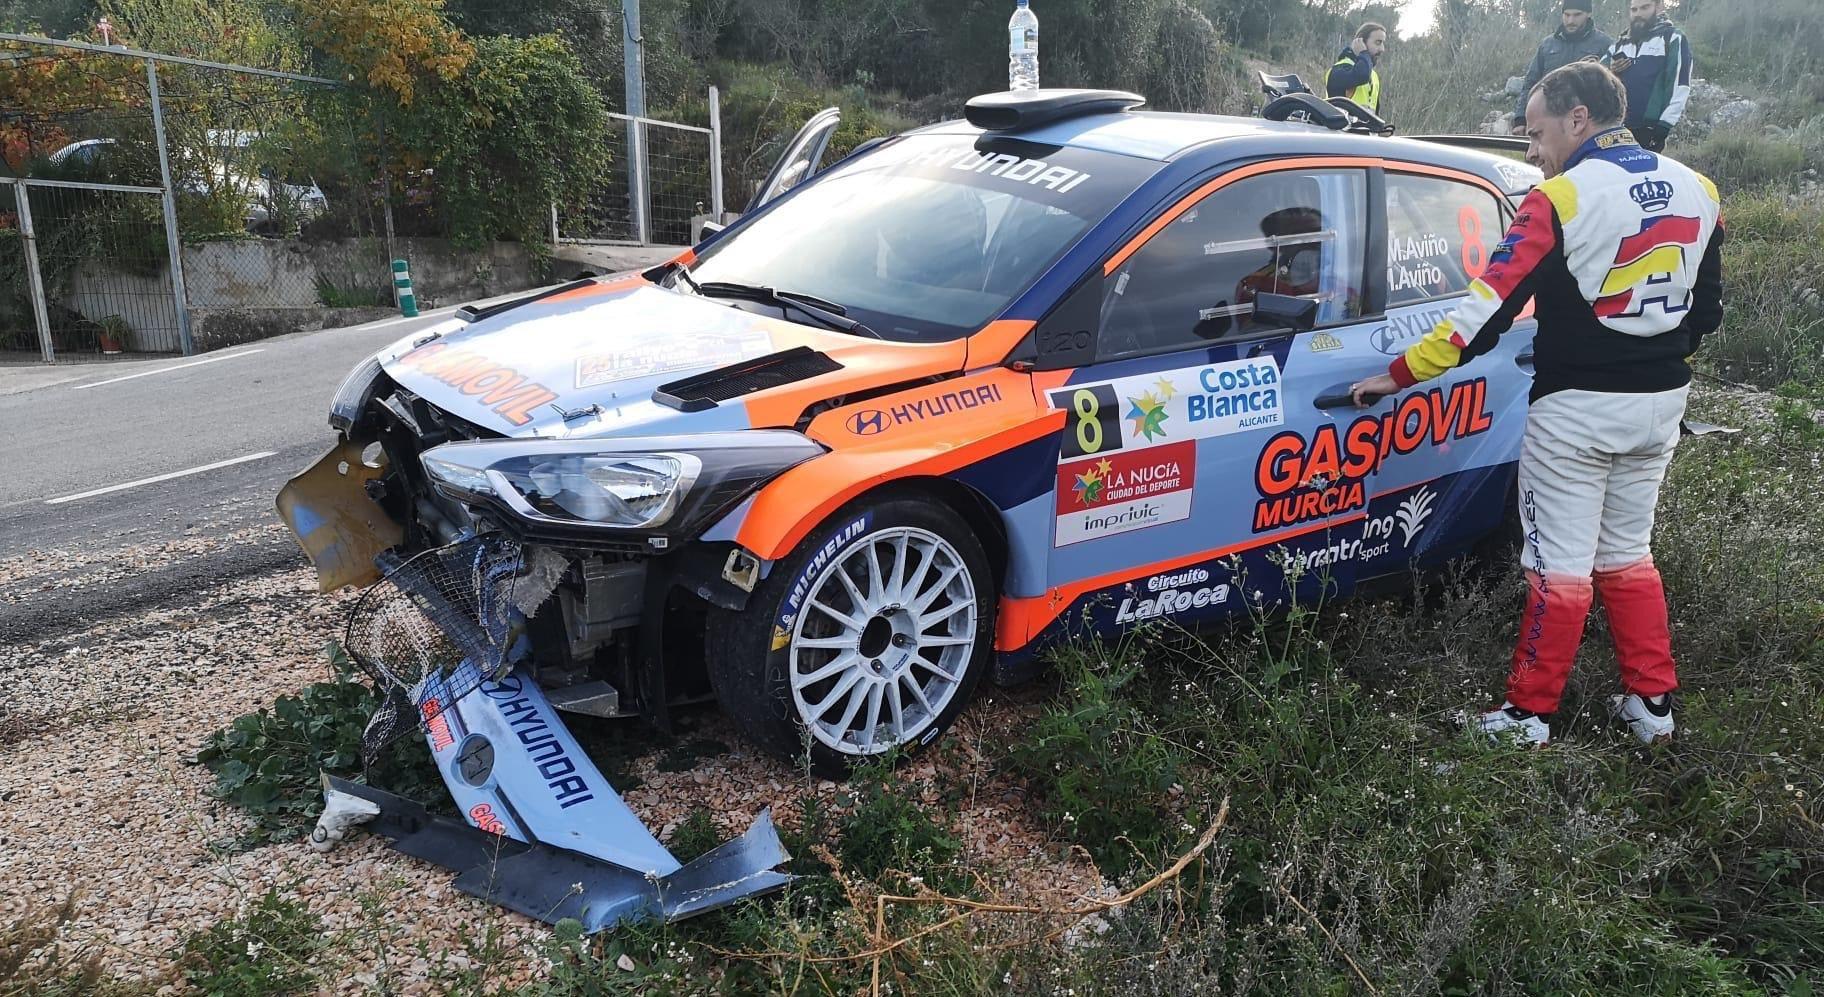 CERA: 25º Rallye La Nucía - Troféo Mediterráneo Costa Blanca [8-9 Noviembre] - Página 2 EI8rY1mWkAUAdjS?format=jpg&name=large